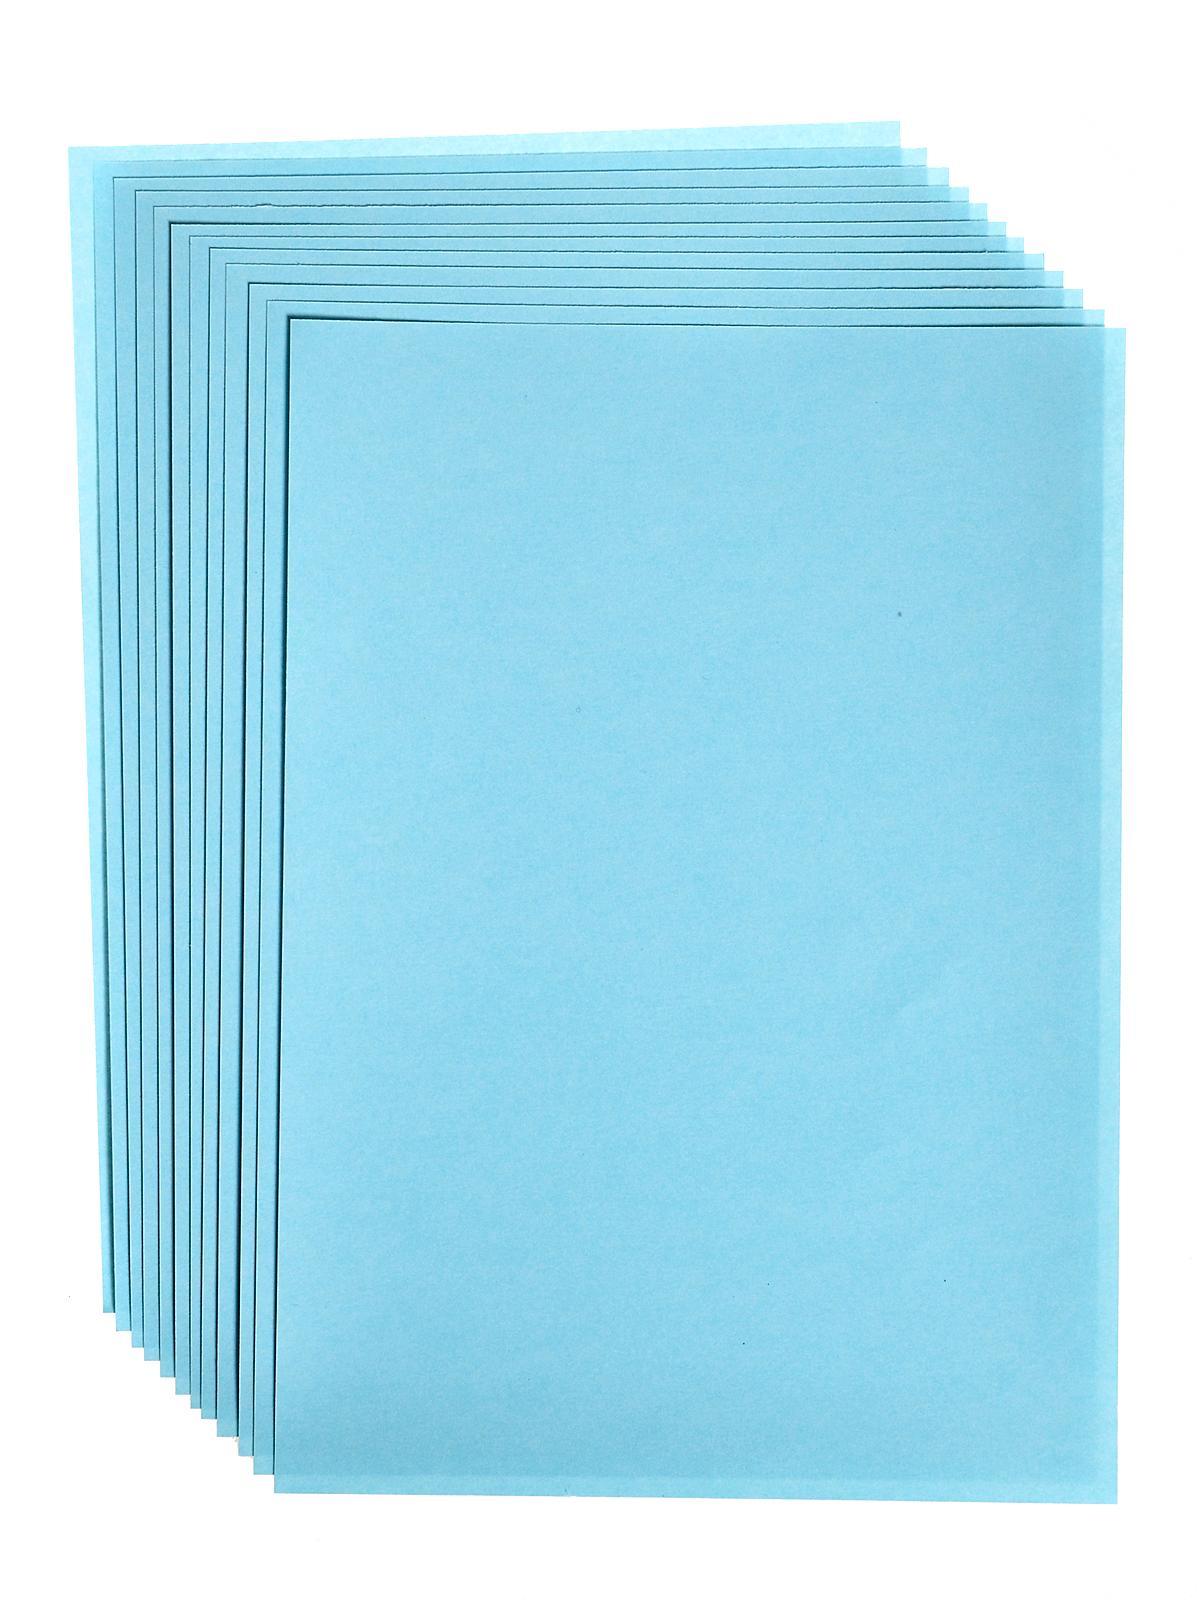 Stamping Mask Paper